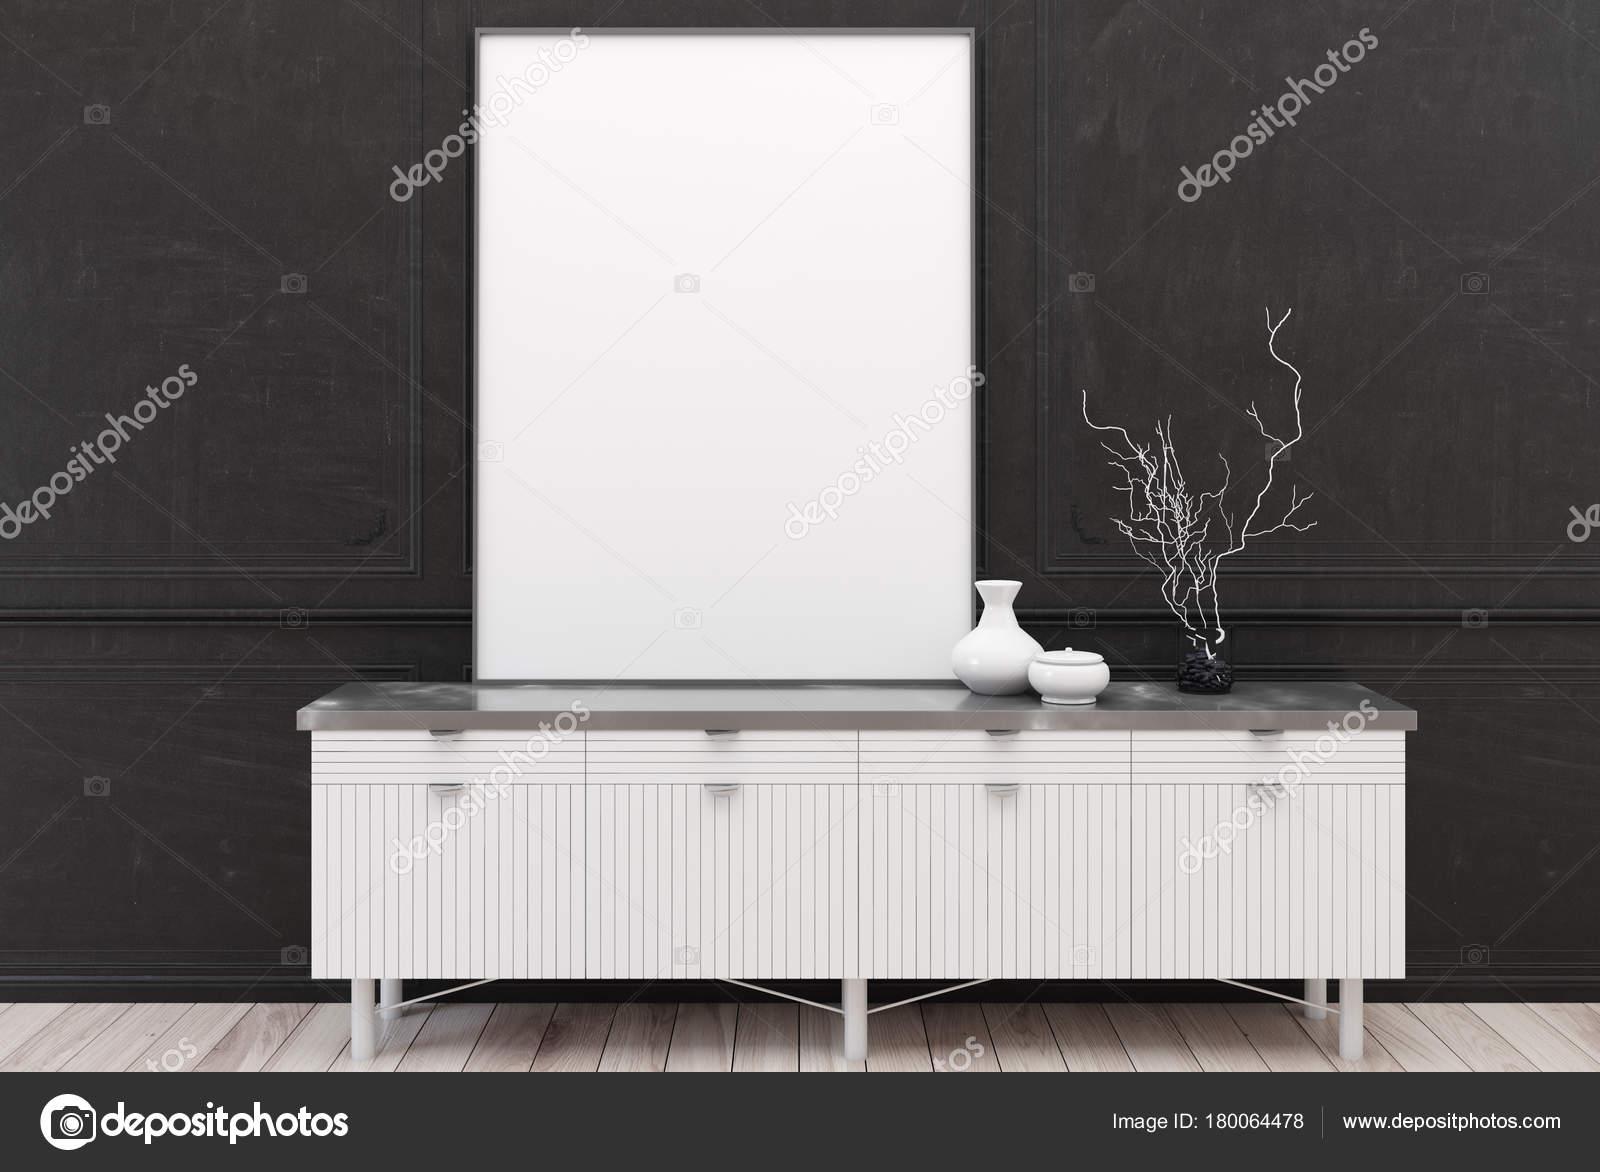 Weiße kommode plakat schwarz u2014 stockfoto © denisismagilov #180064478